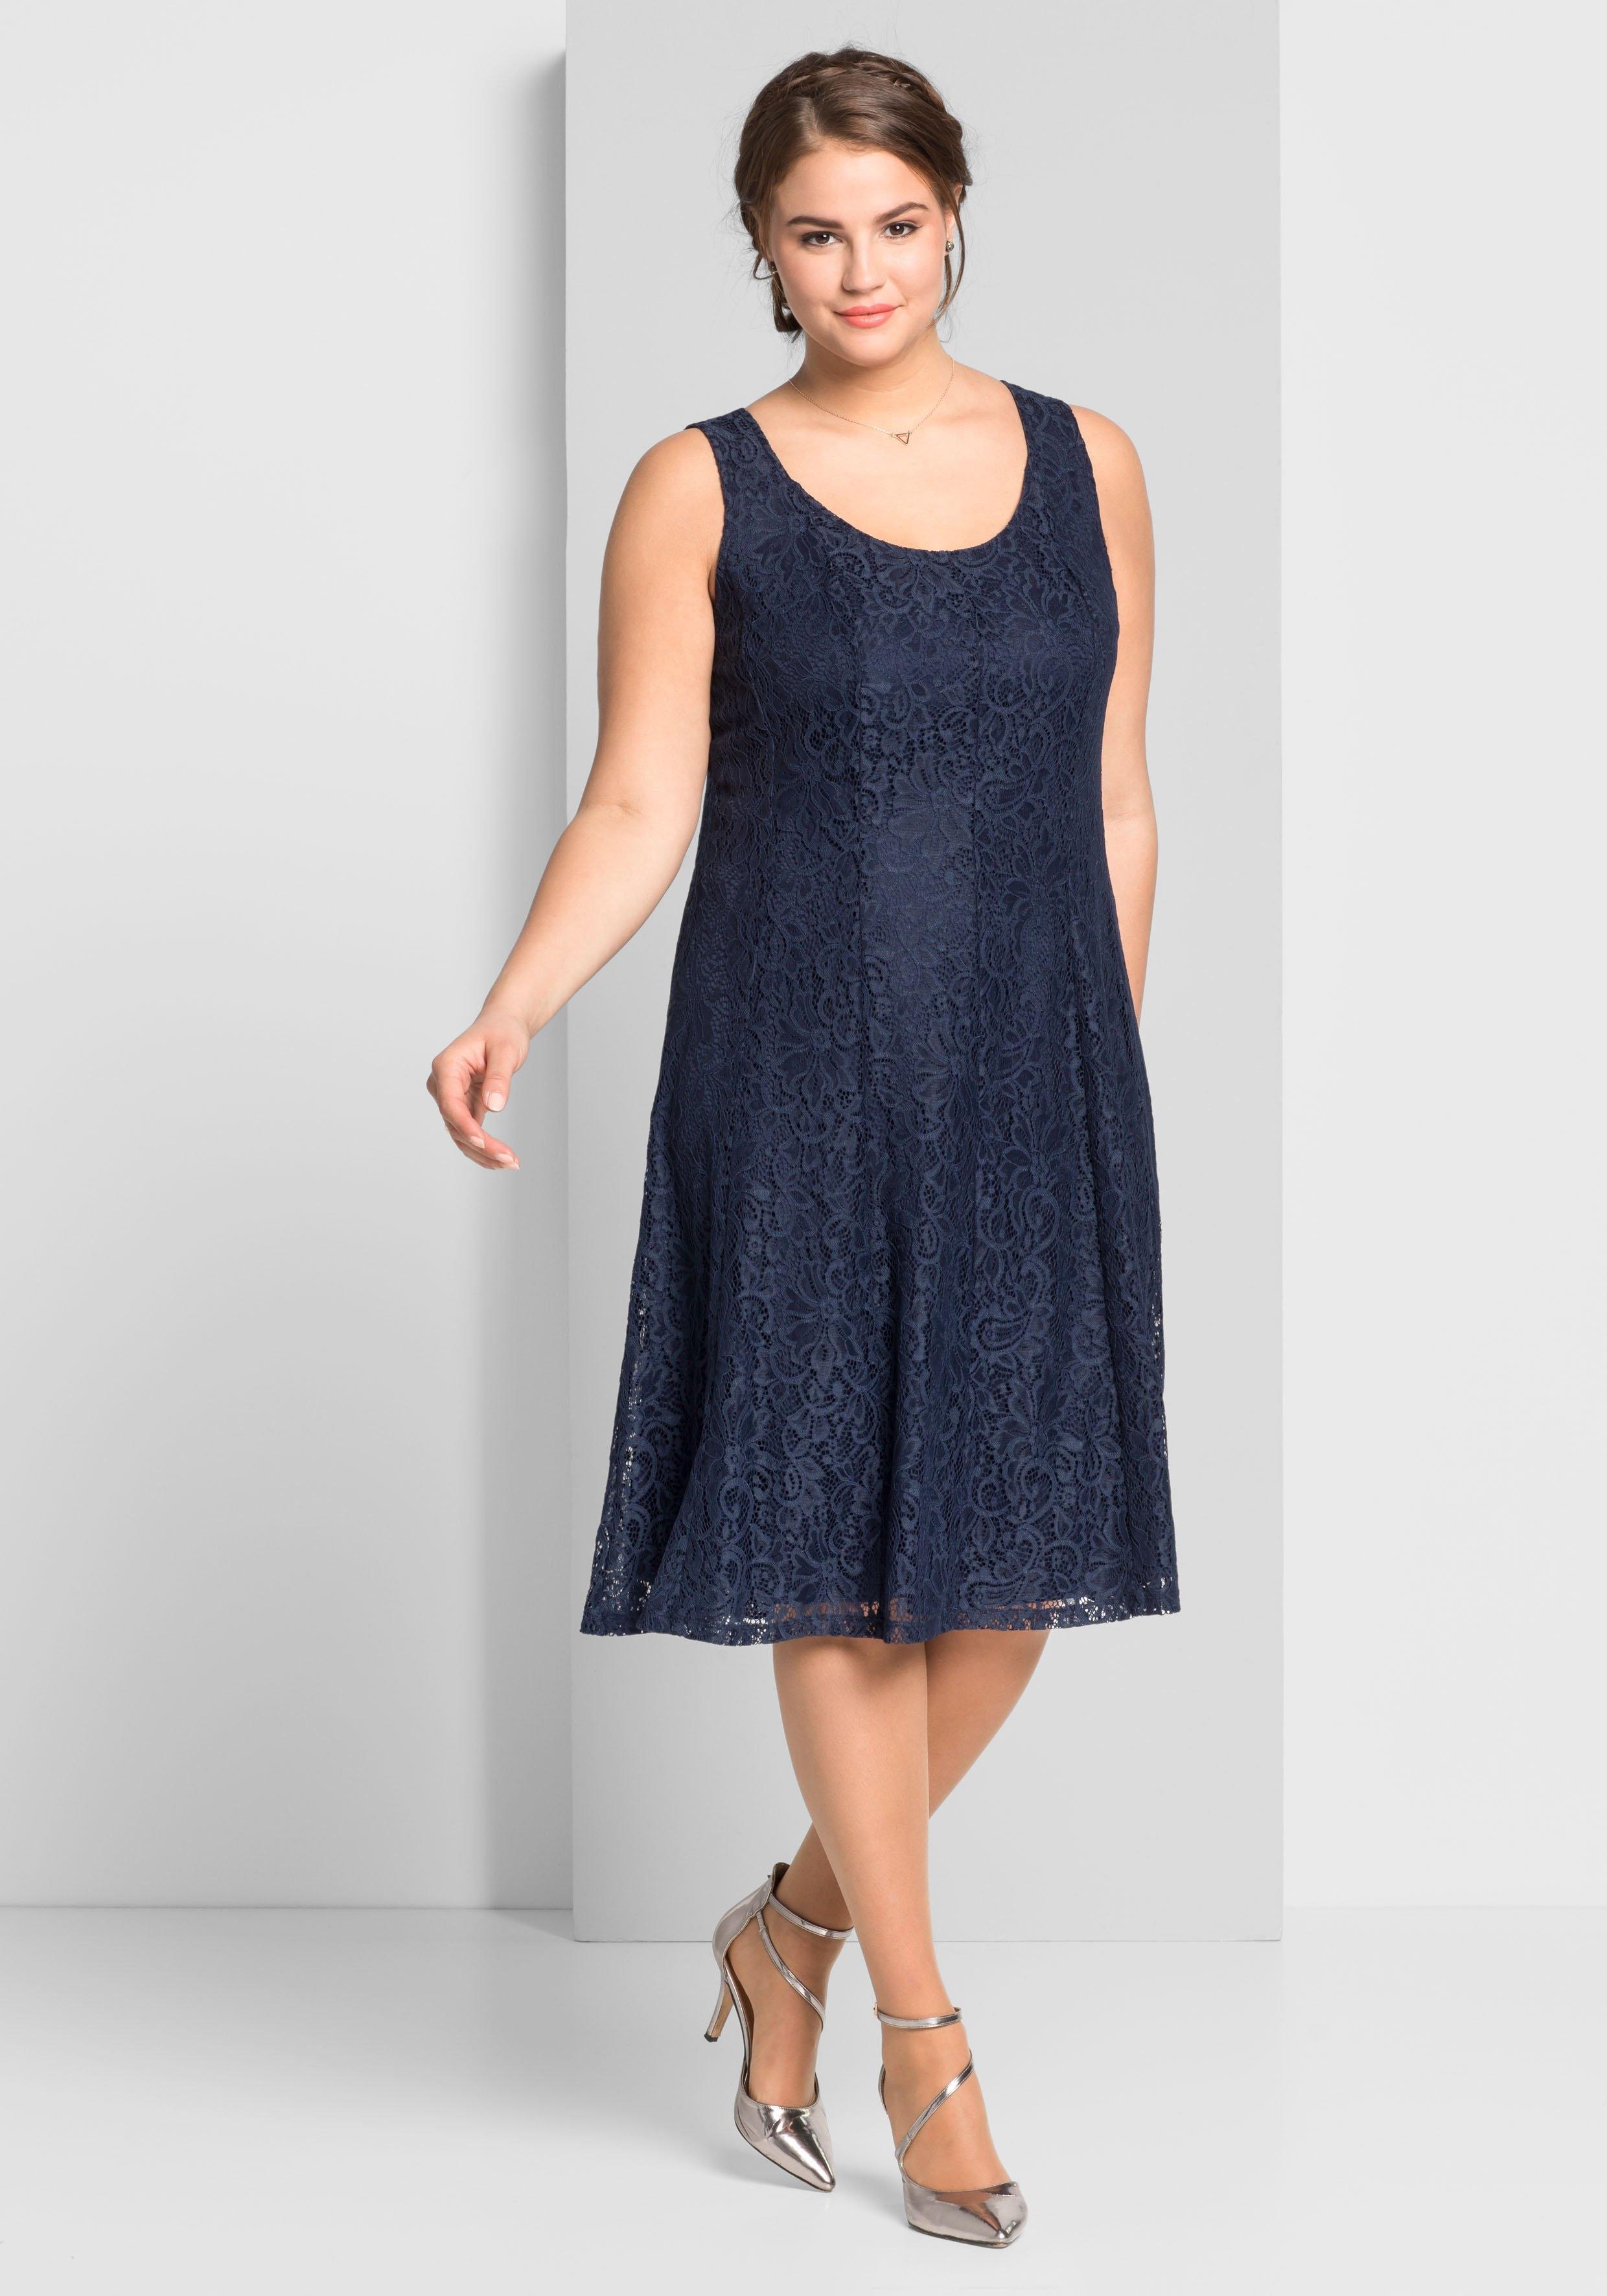 Sheego Style kanten jurk nu online kopen bij OTTO